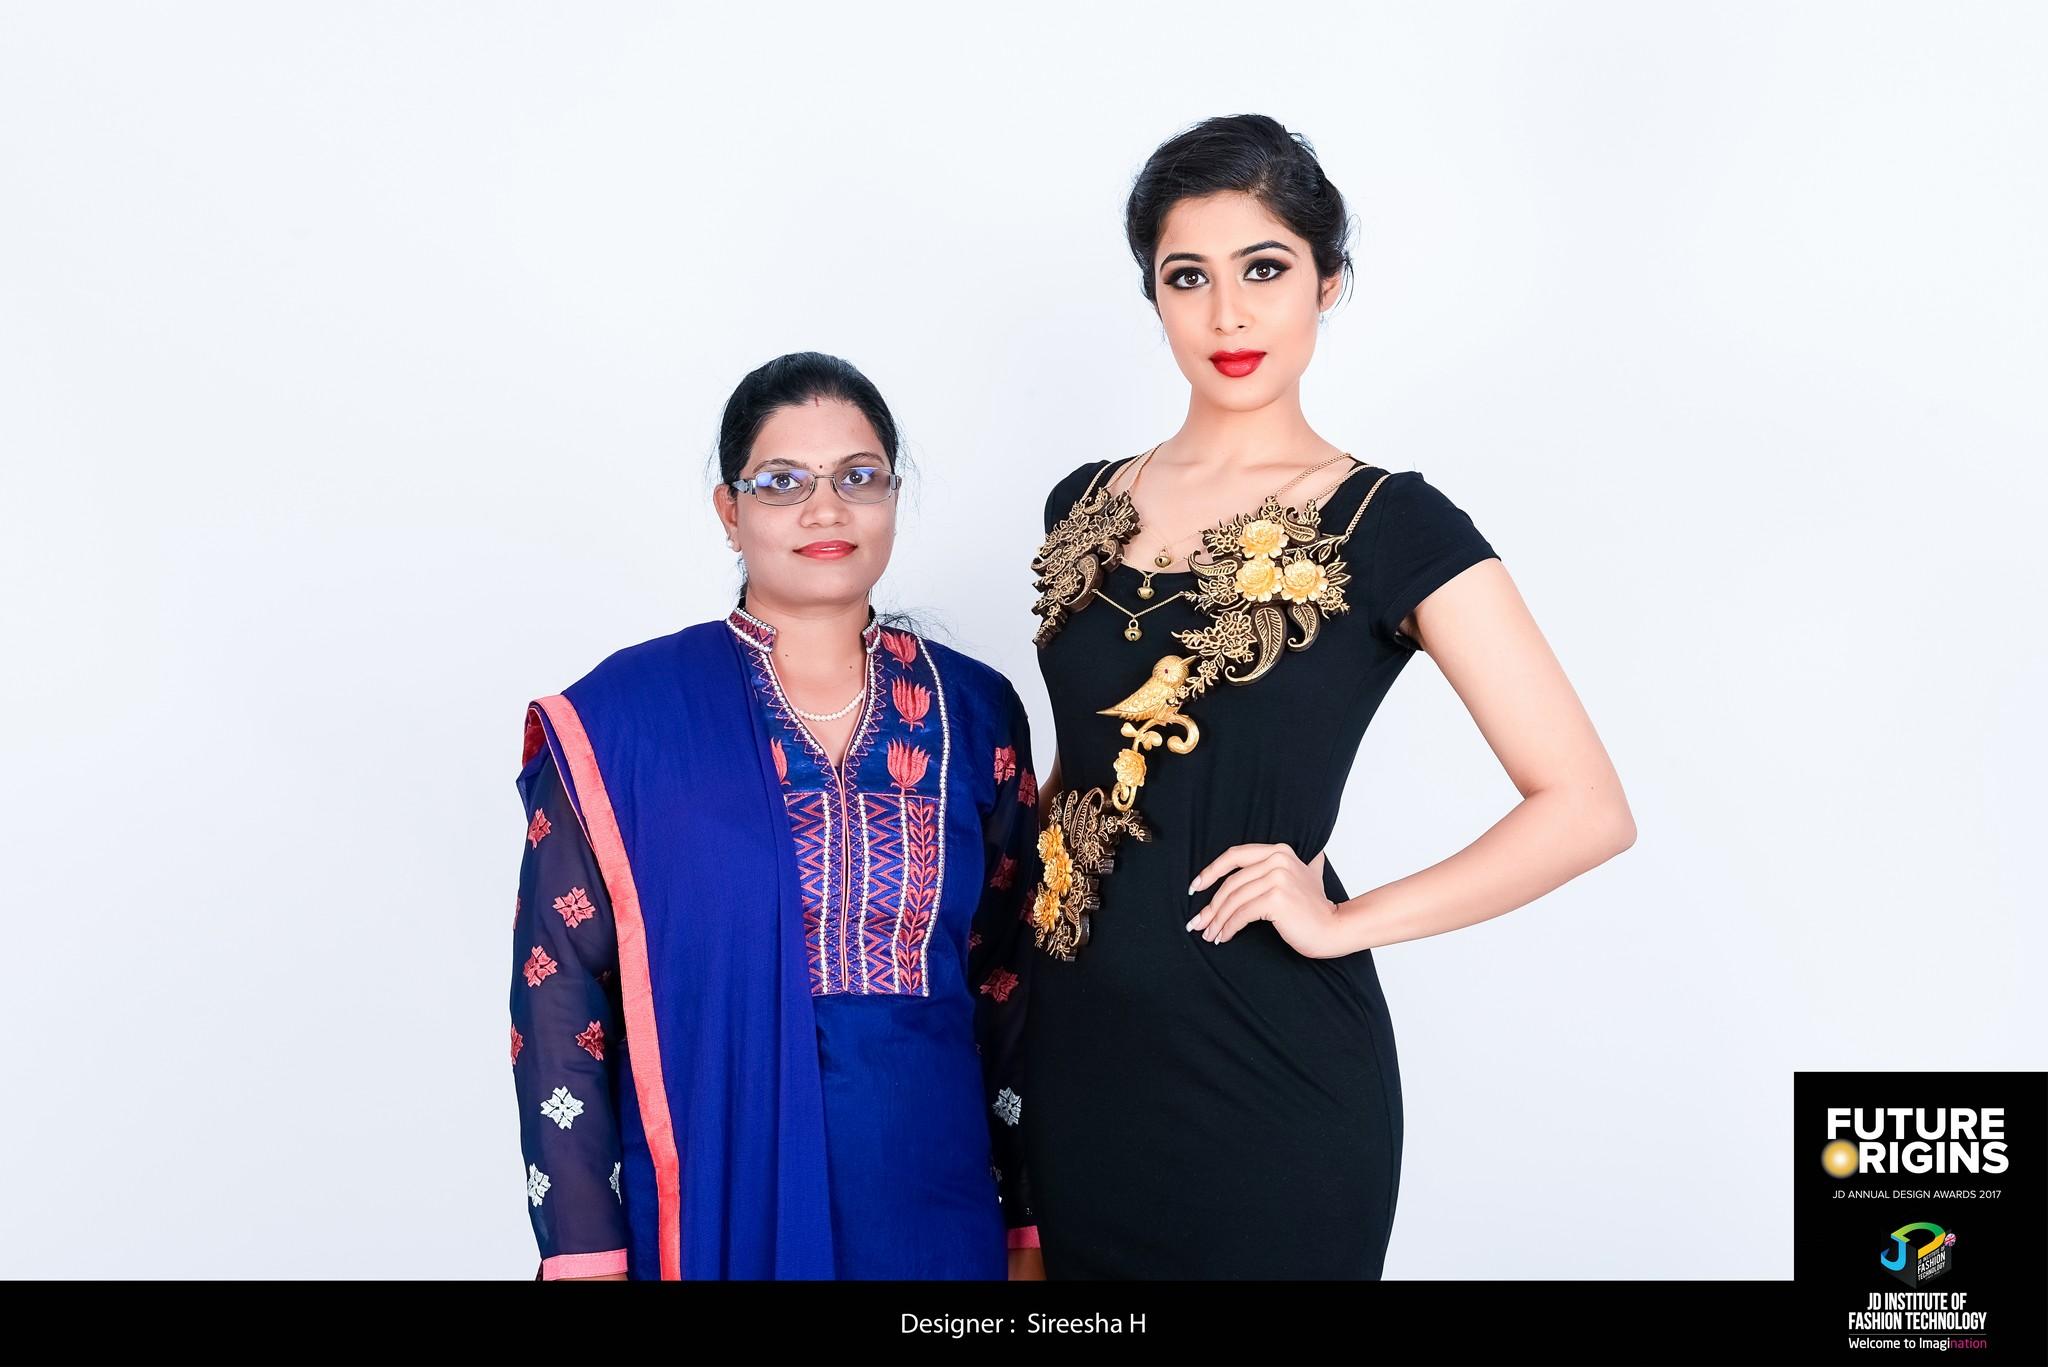 Hastatkaar - Future Origin - JD Annual Design Awards 2017   Photography : Jerin Nath (@jerin_nath) hastatkaar - Hastatkaar     Future Origin     JD Annual Design Awards 2017 3 - Hastatkaar – Future Origin – JD Annual Design Awards 2017